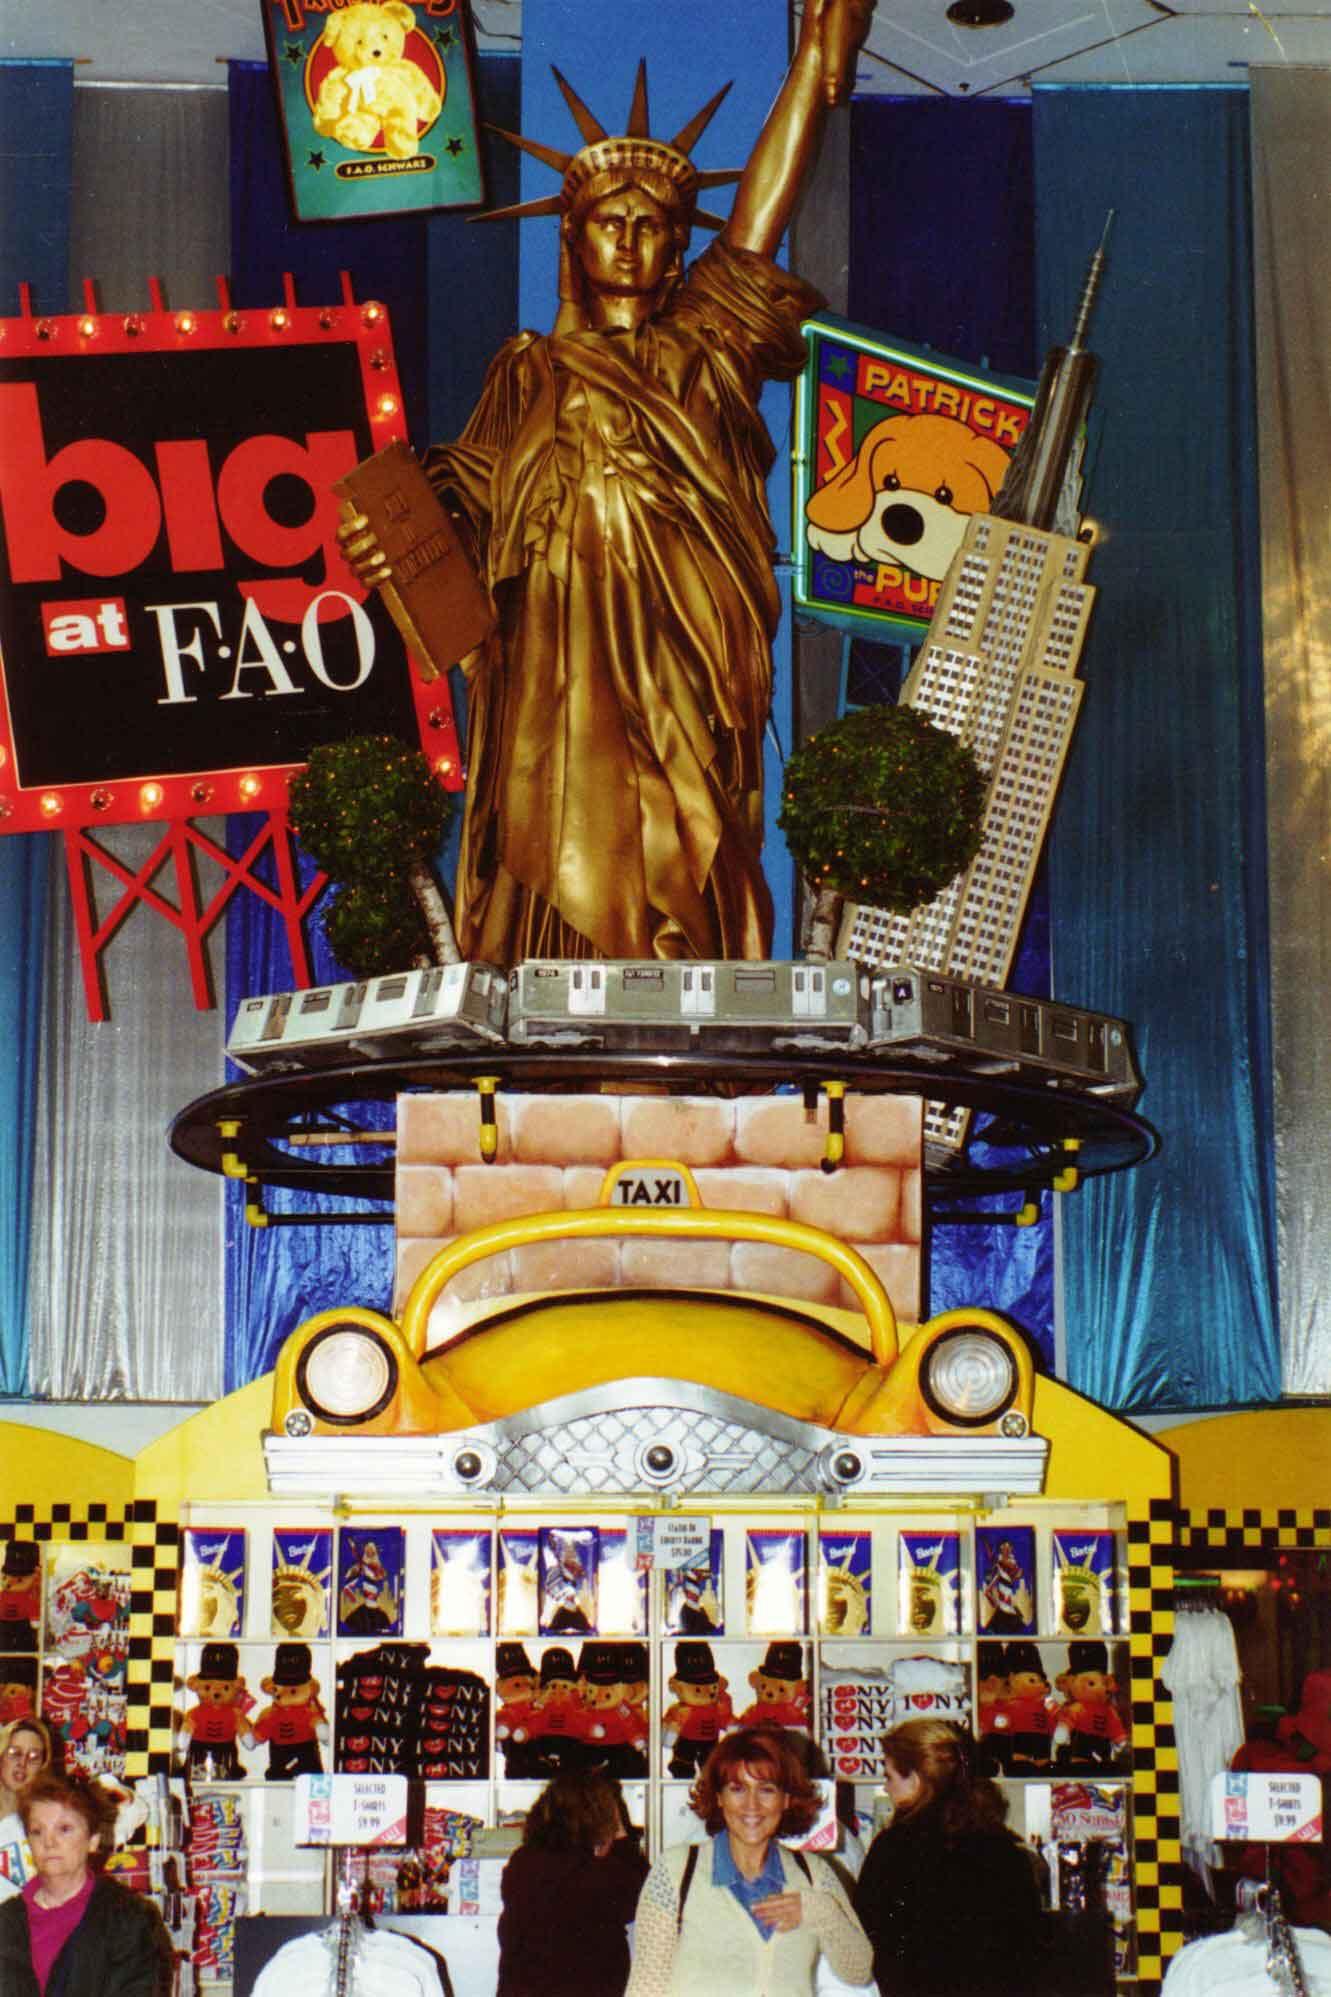 new york-fao schwartz-shopping-manhattan-fith avenue-giocattoli